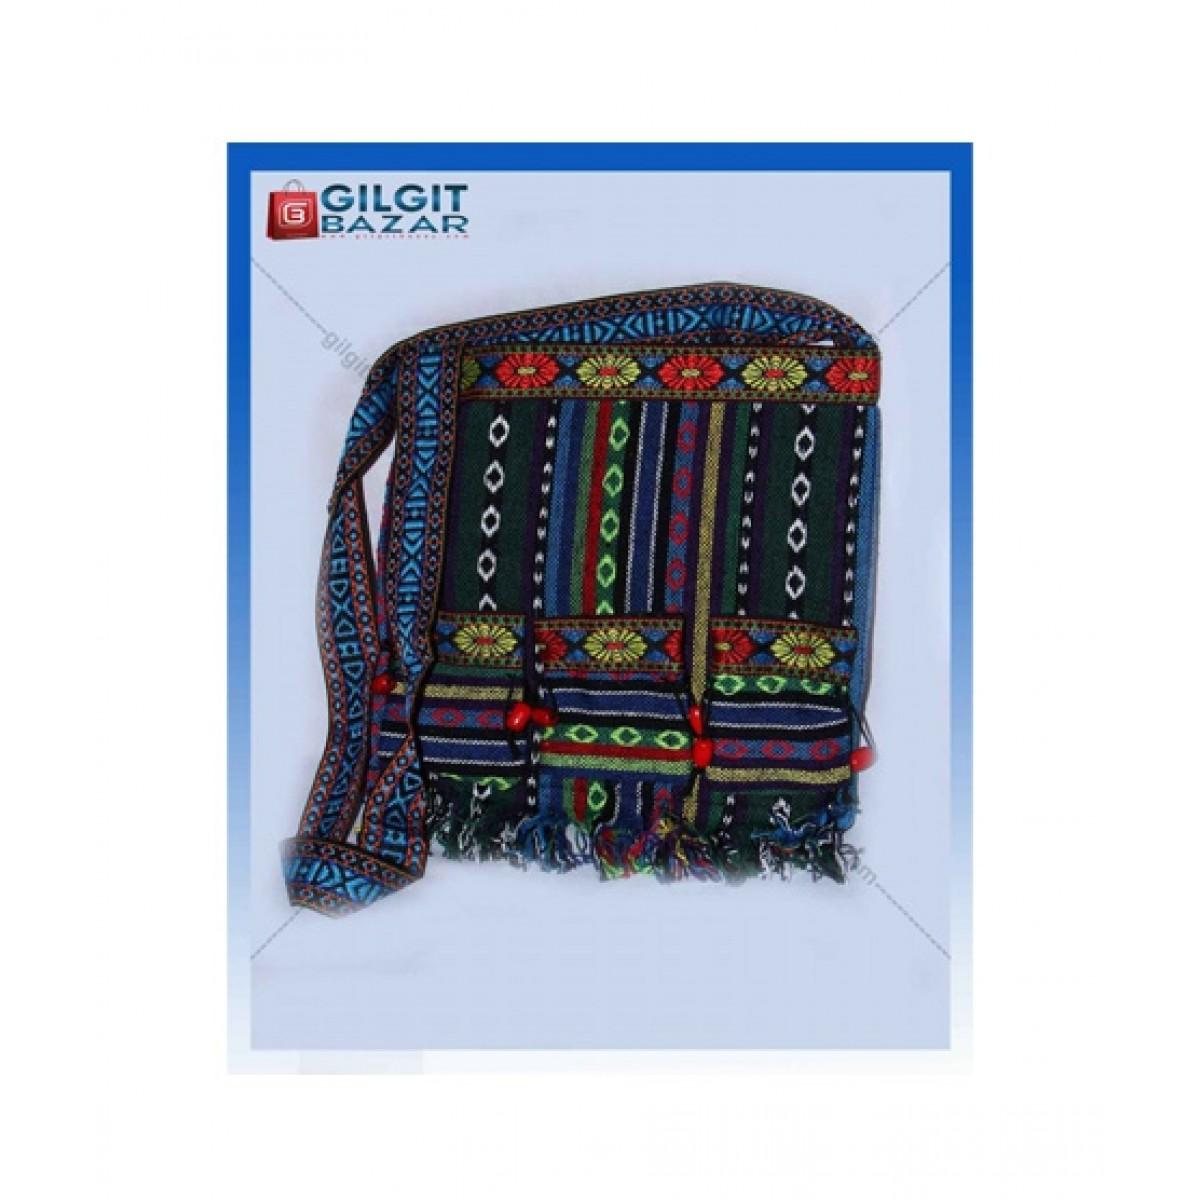 Gilgit Bazar Ladies Hand Bag For Women Black (Gb2506)